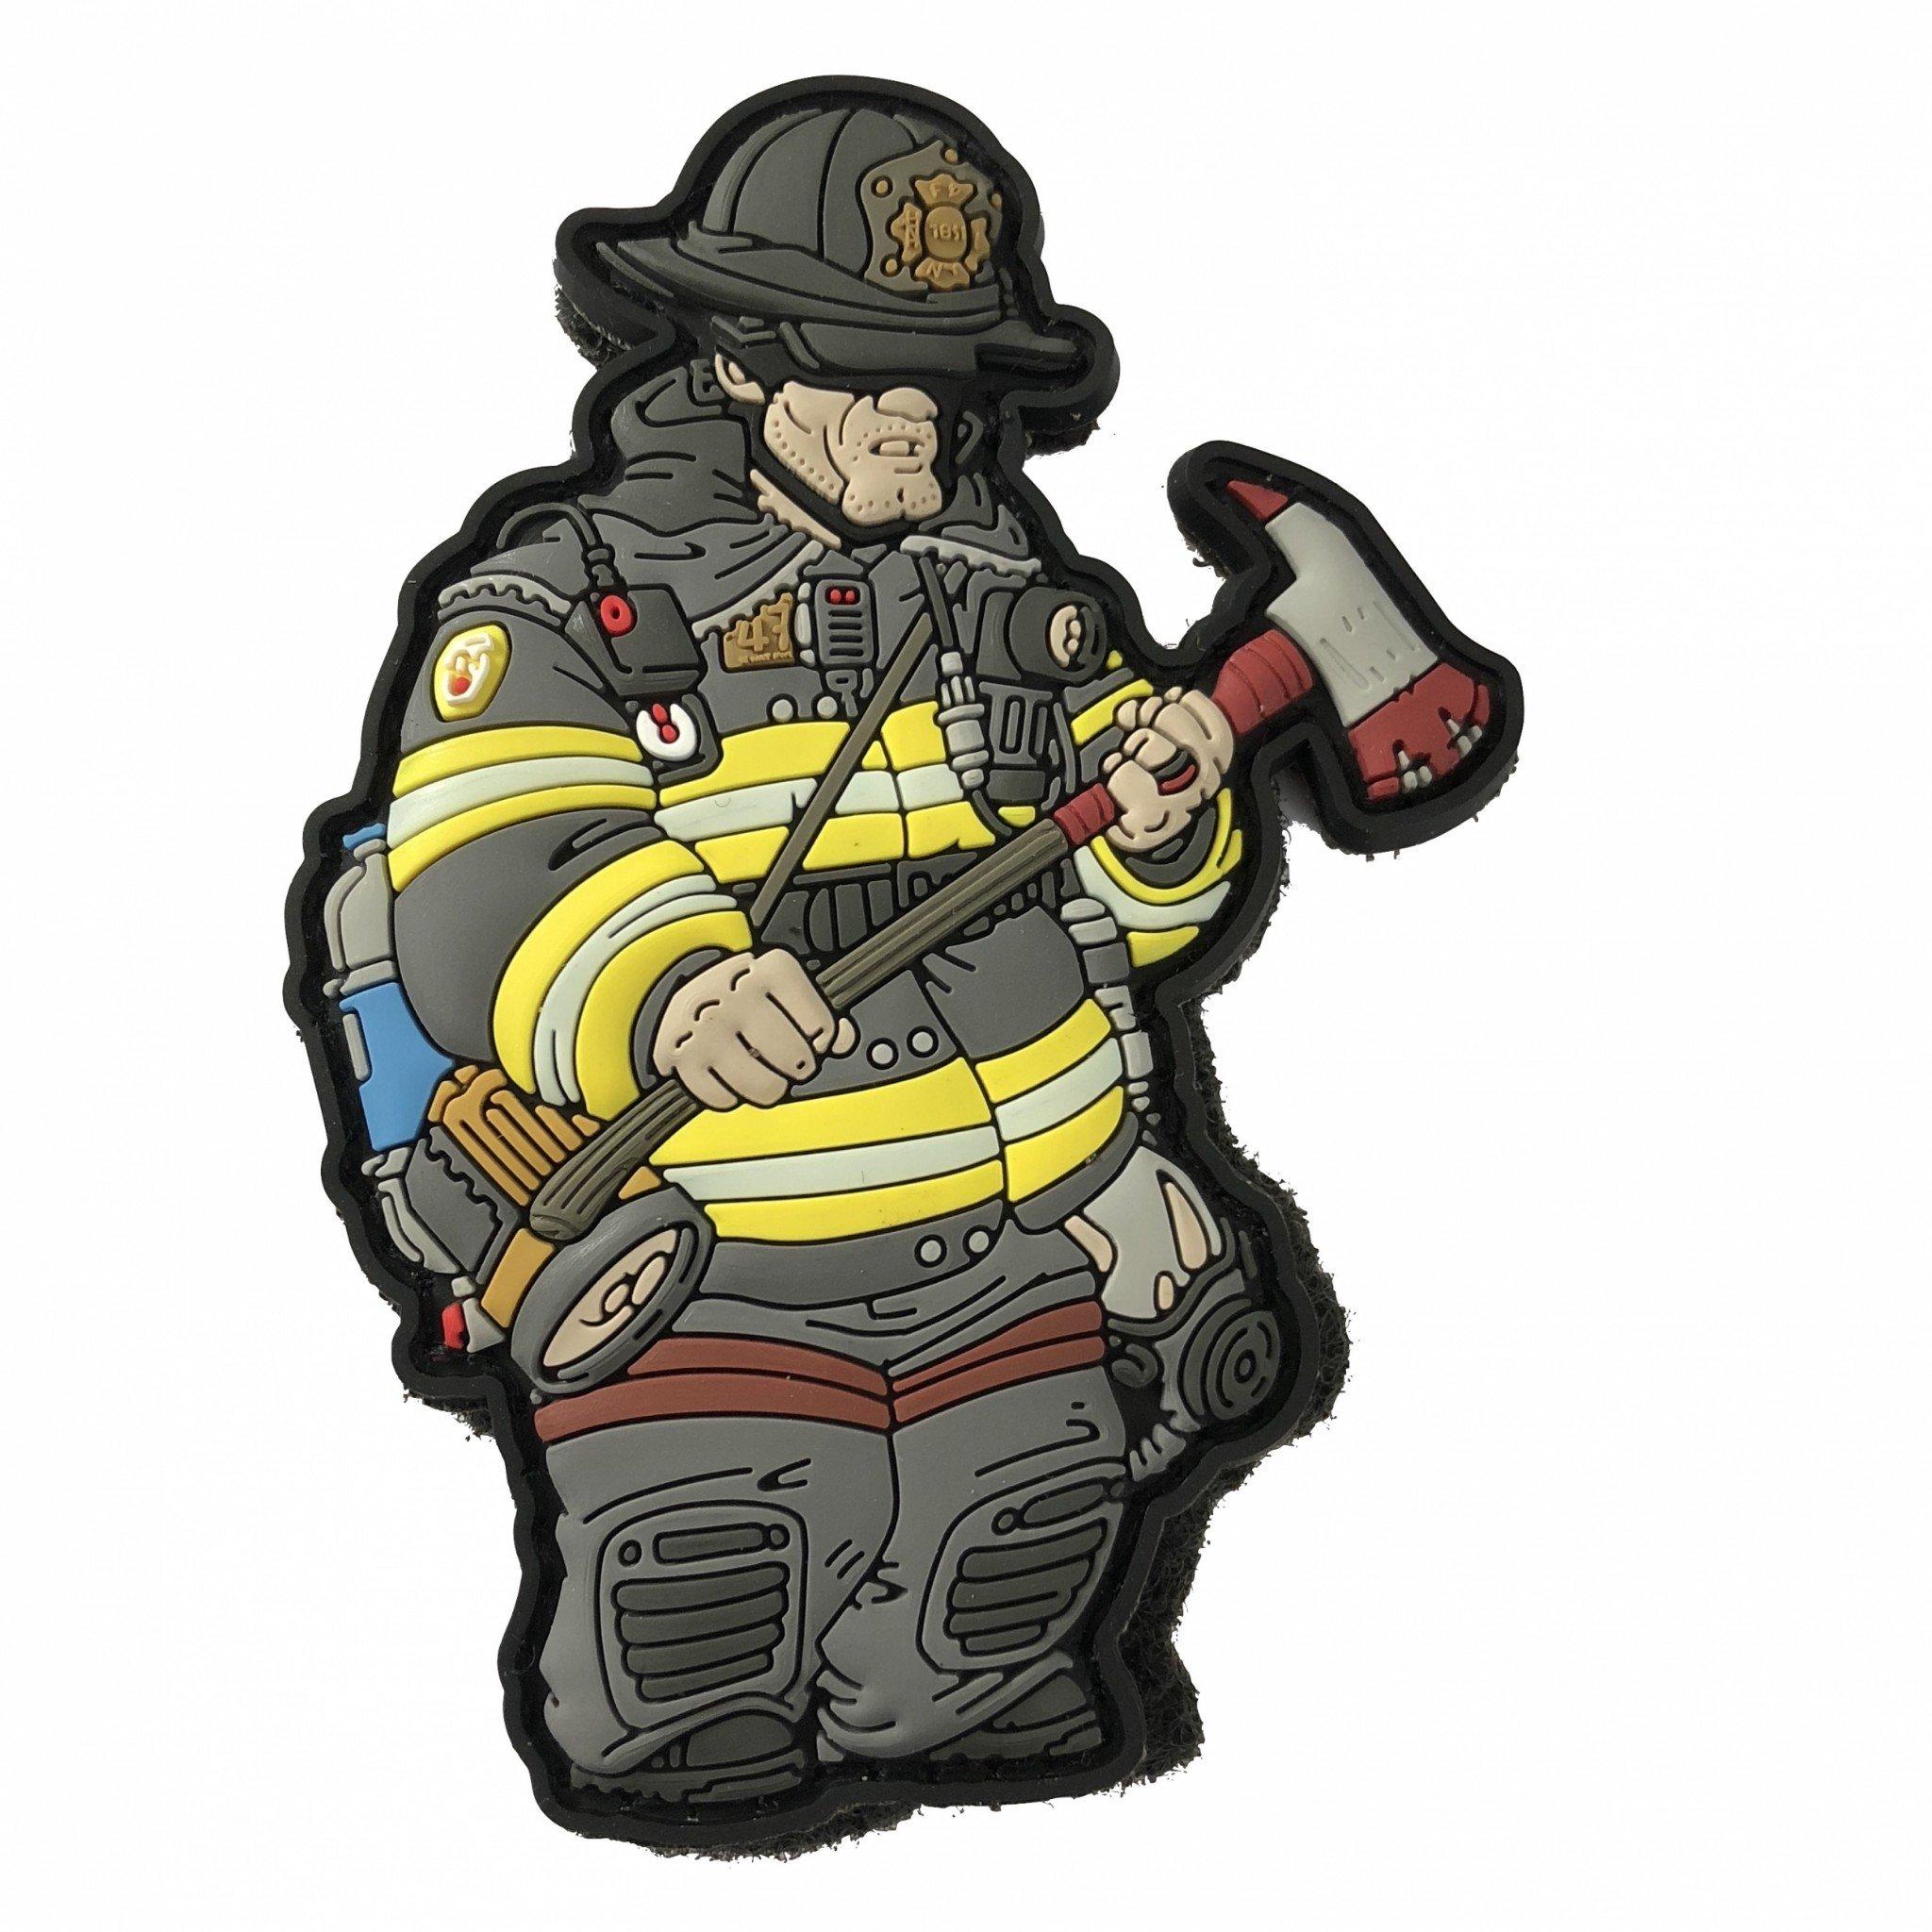 Operator Patch – NYFD Firefighter